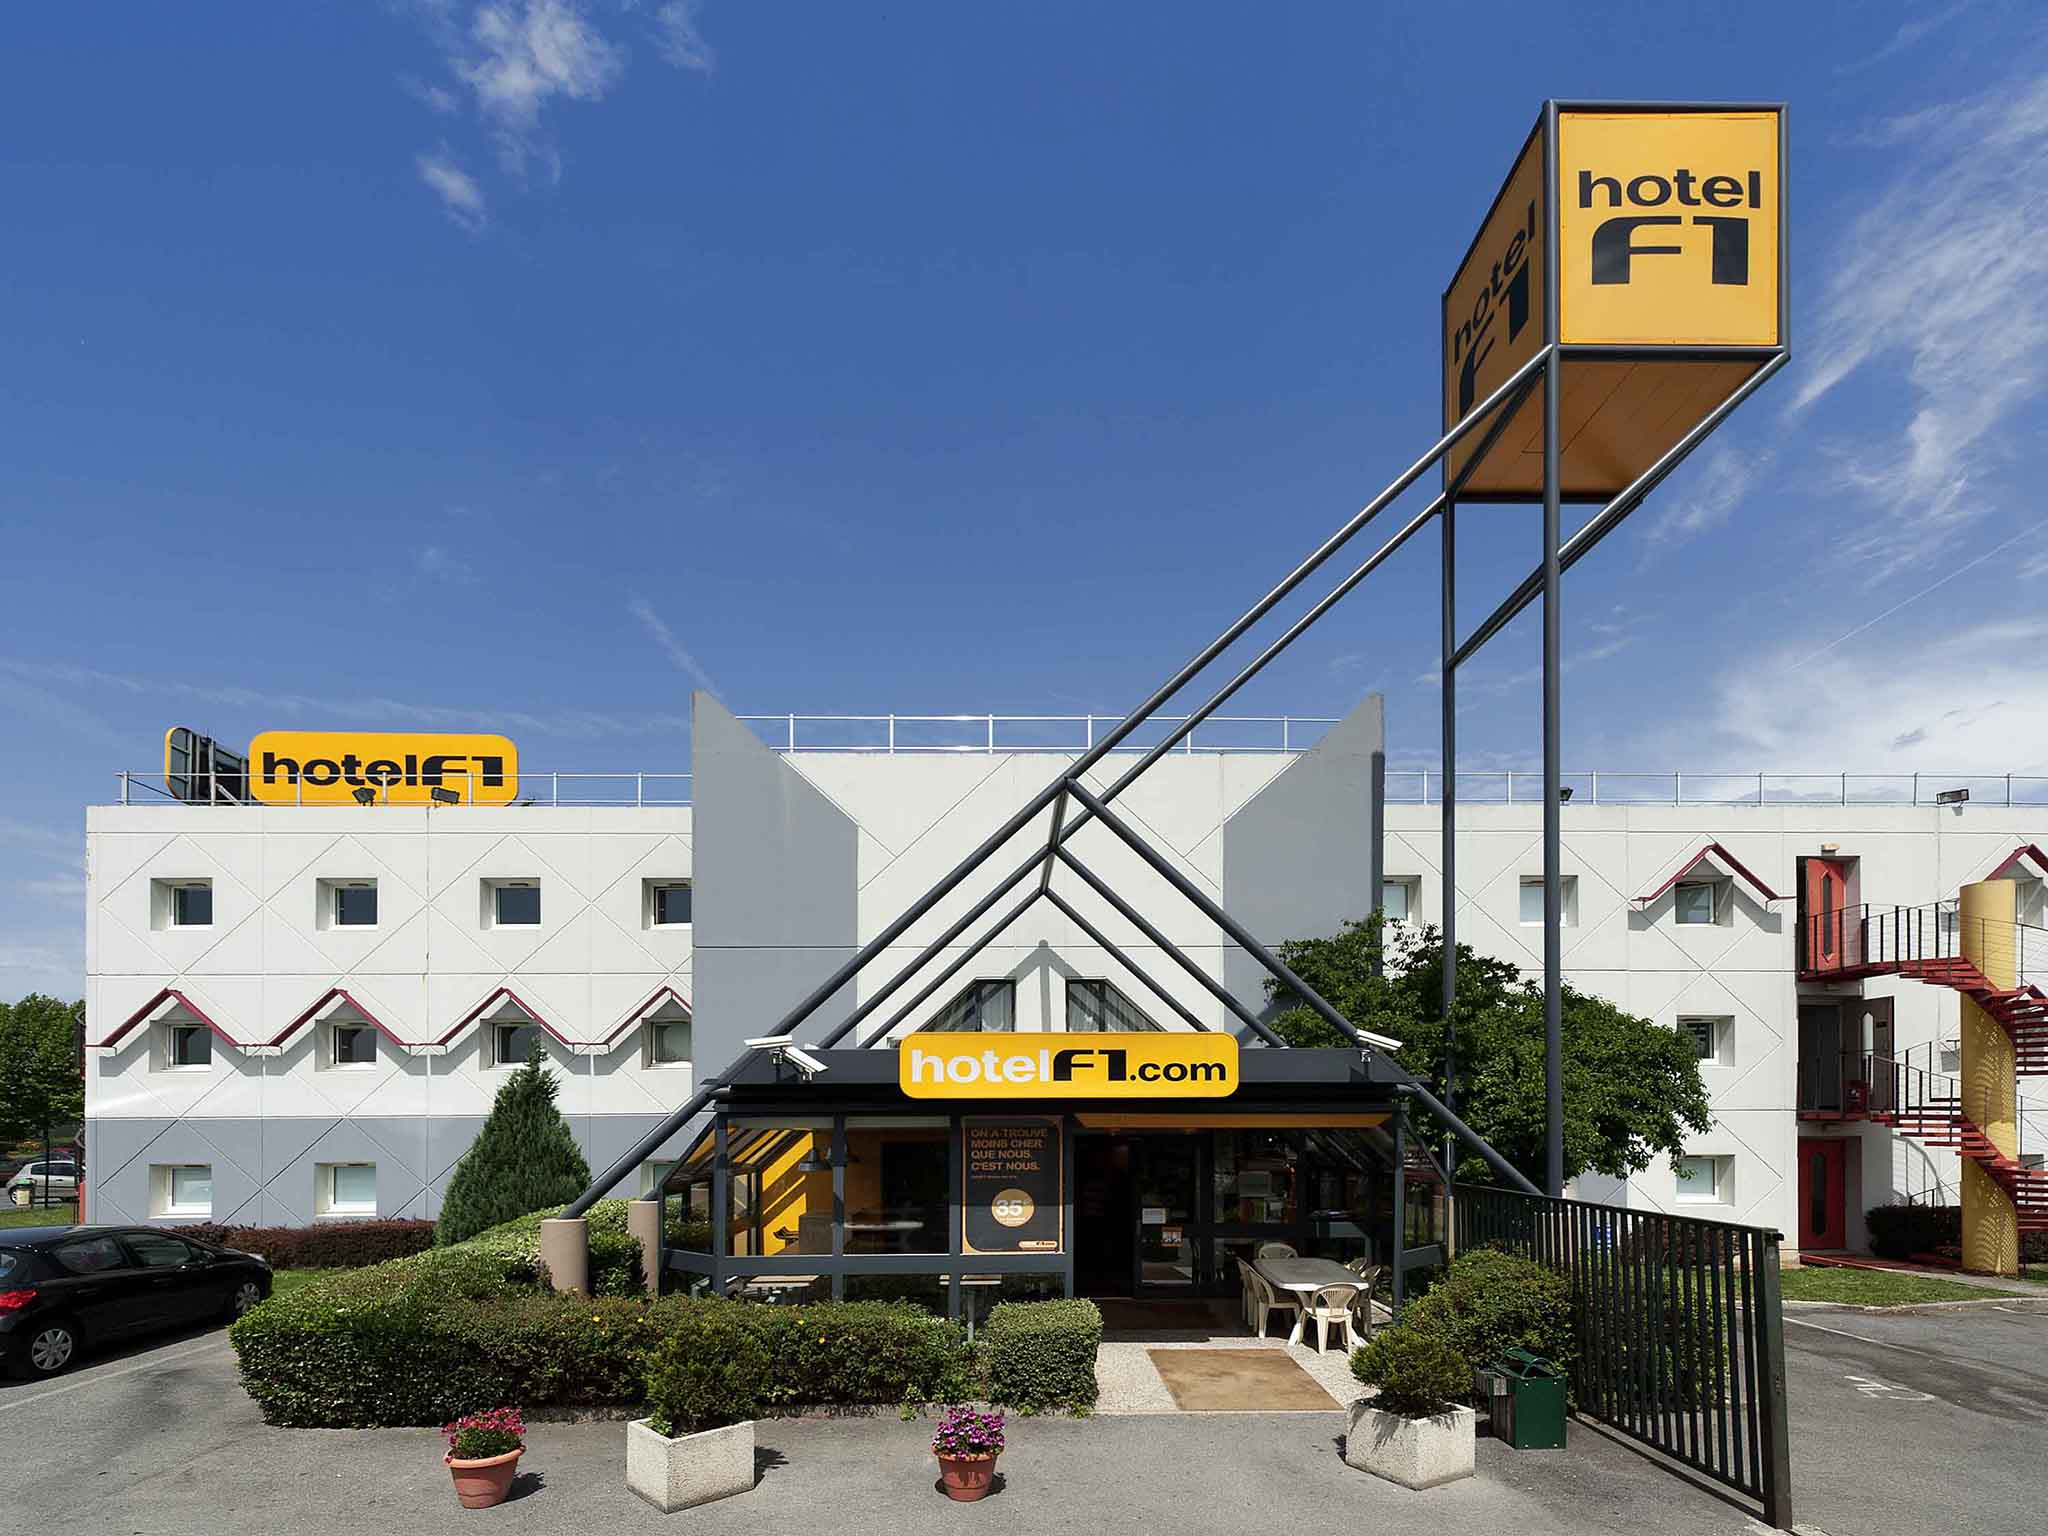 酒店 – hotelF1 Toulon Ouest La-Seyne